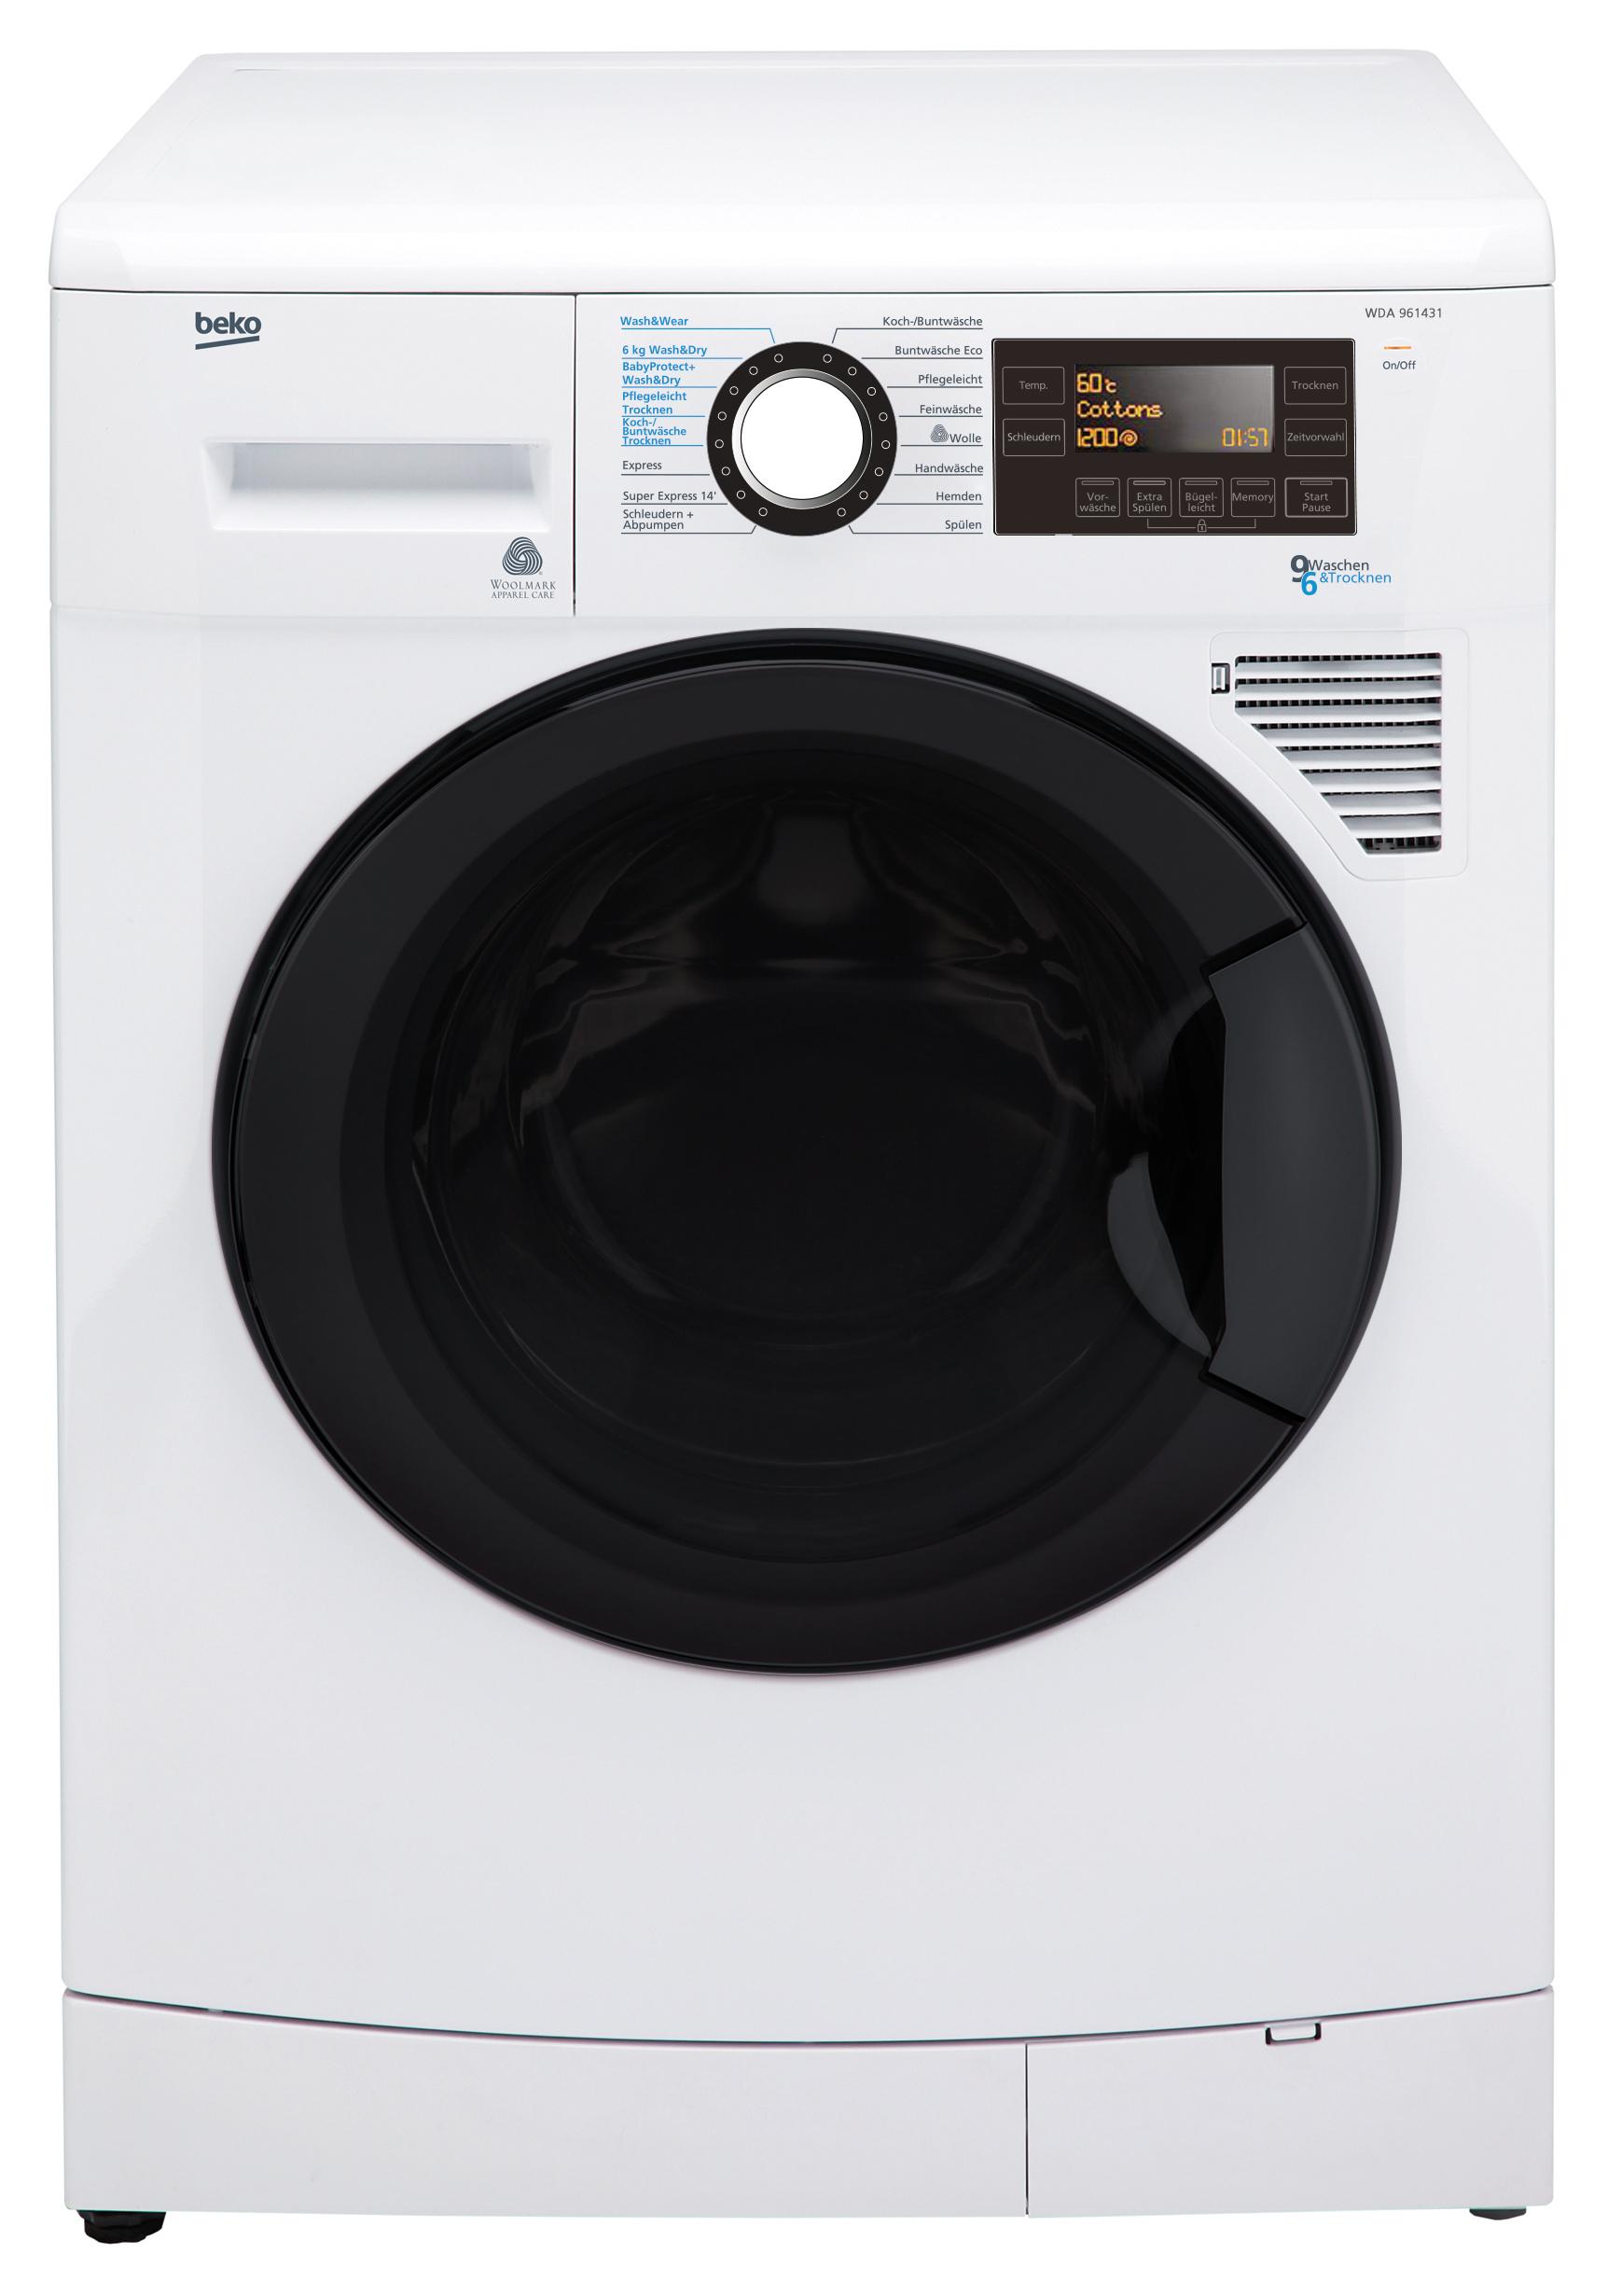 beko waschtrockner wda 961431 9 kilo waschen 6 kilo trocknen. Black Bedroom Furniture Sets. Home Design Ideas